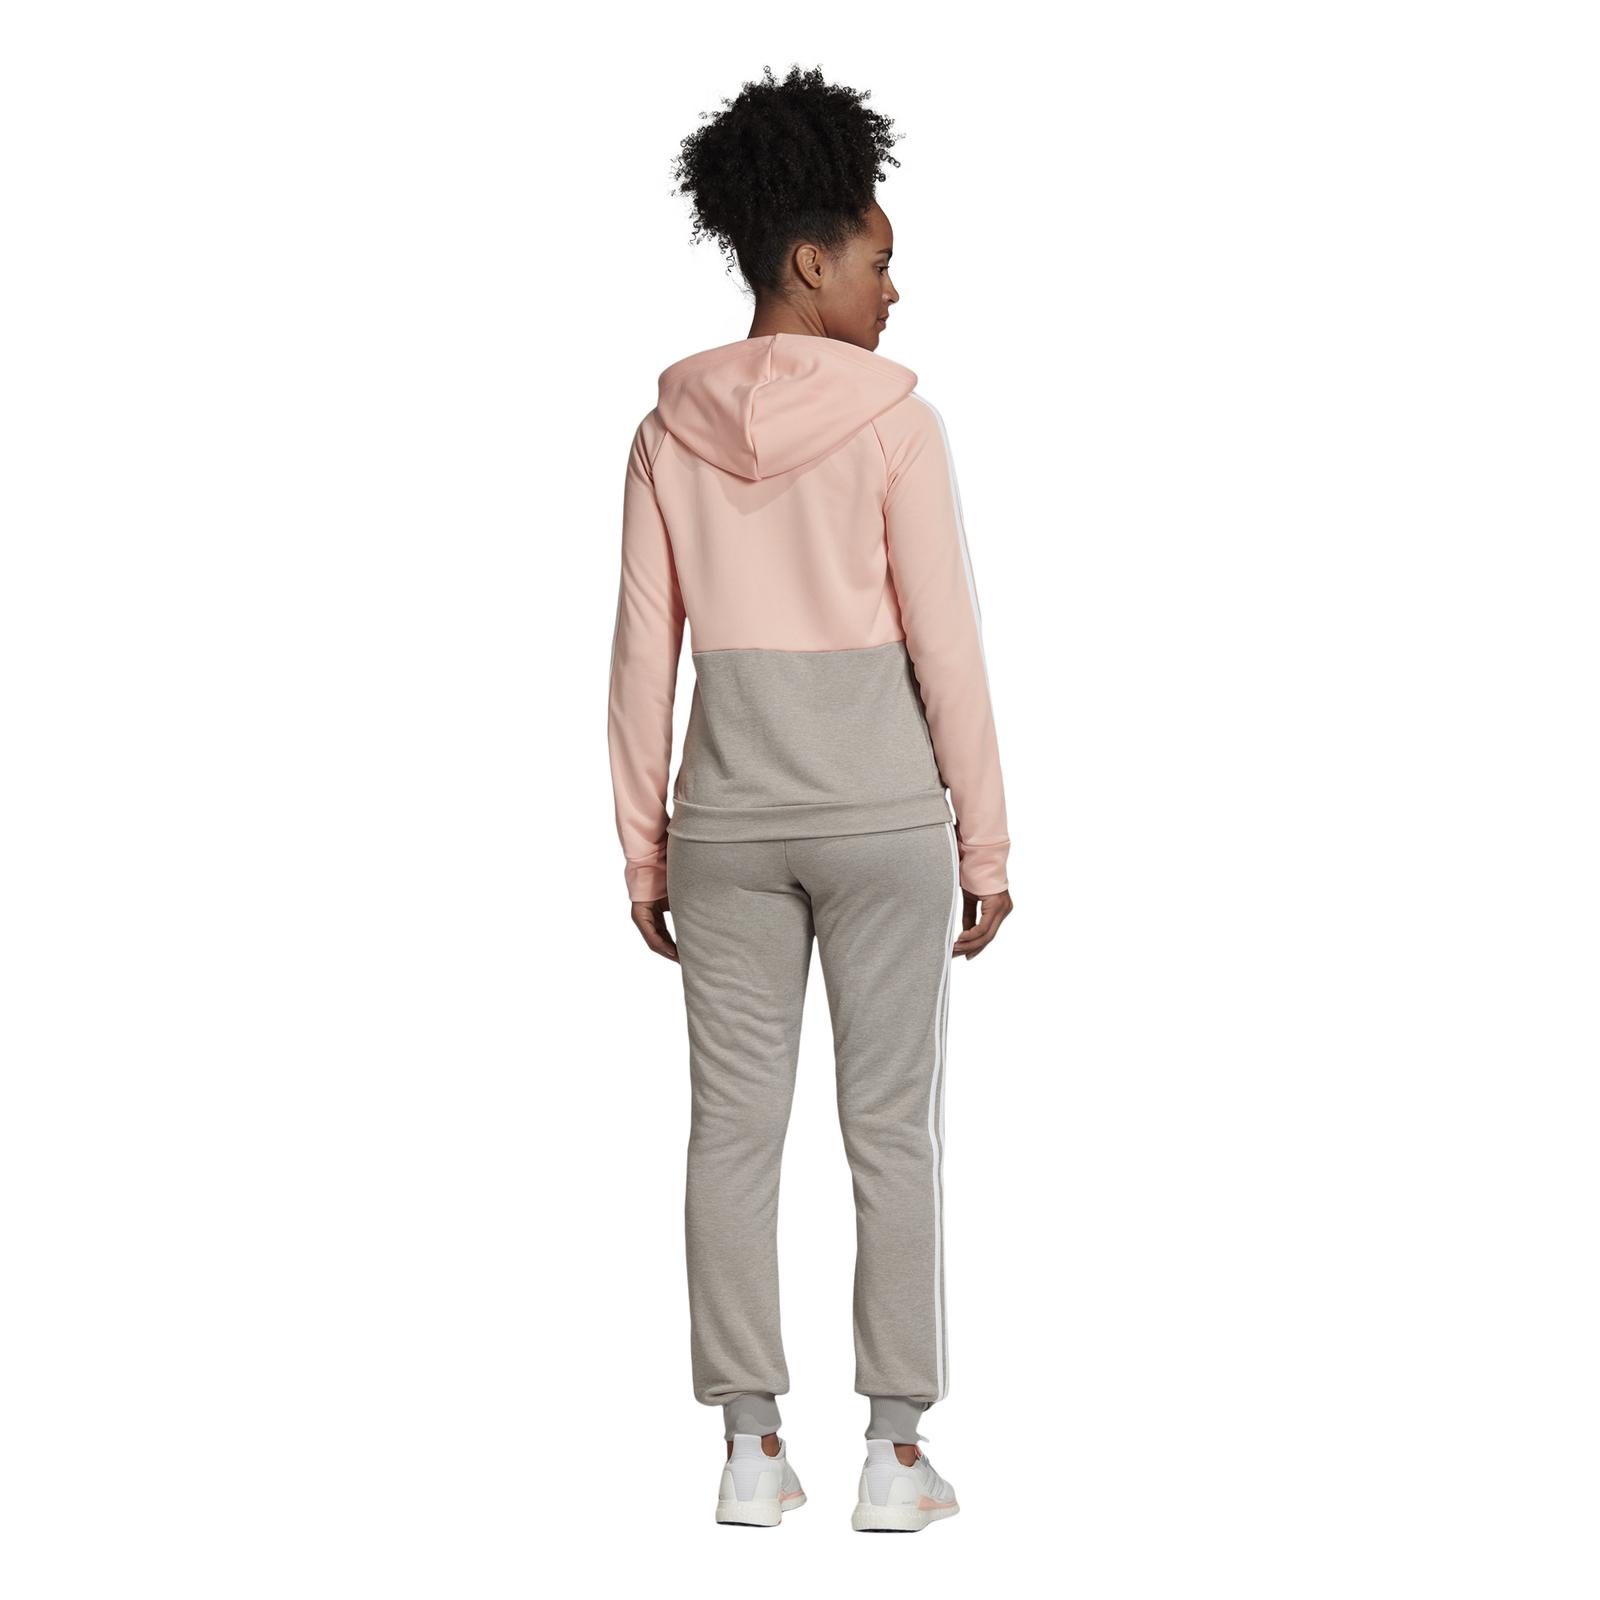 jogging femme adidas rose